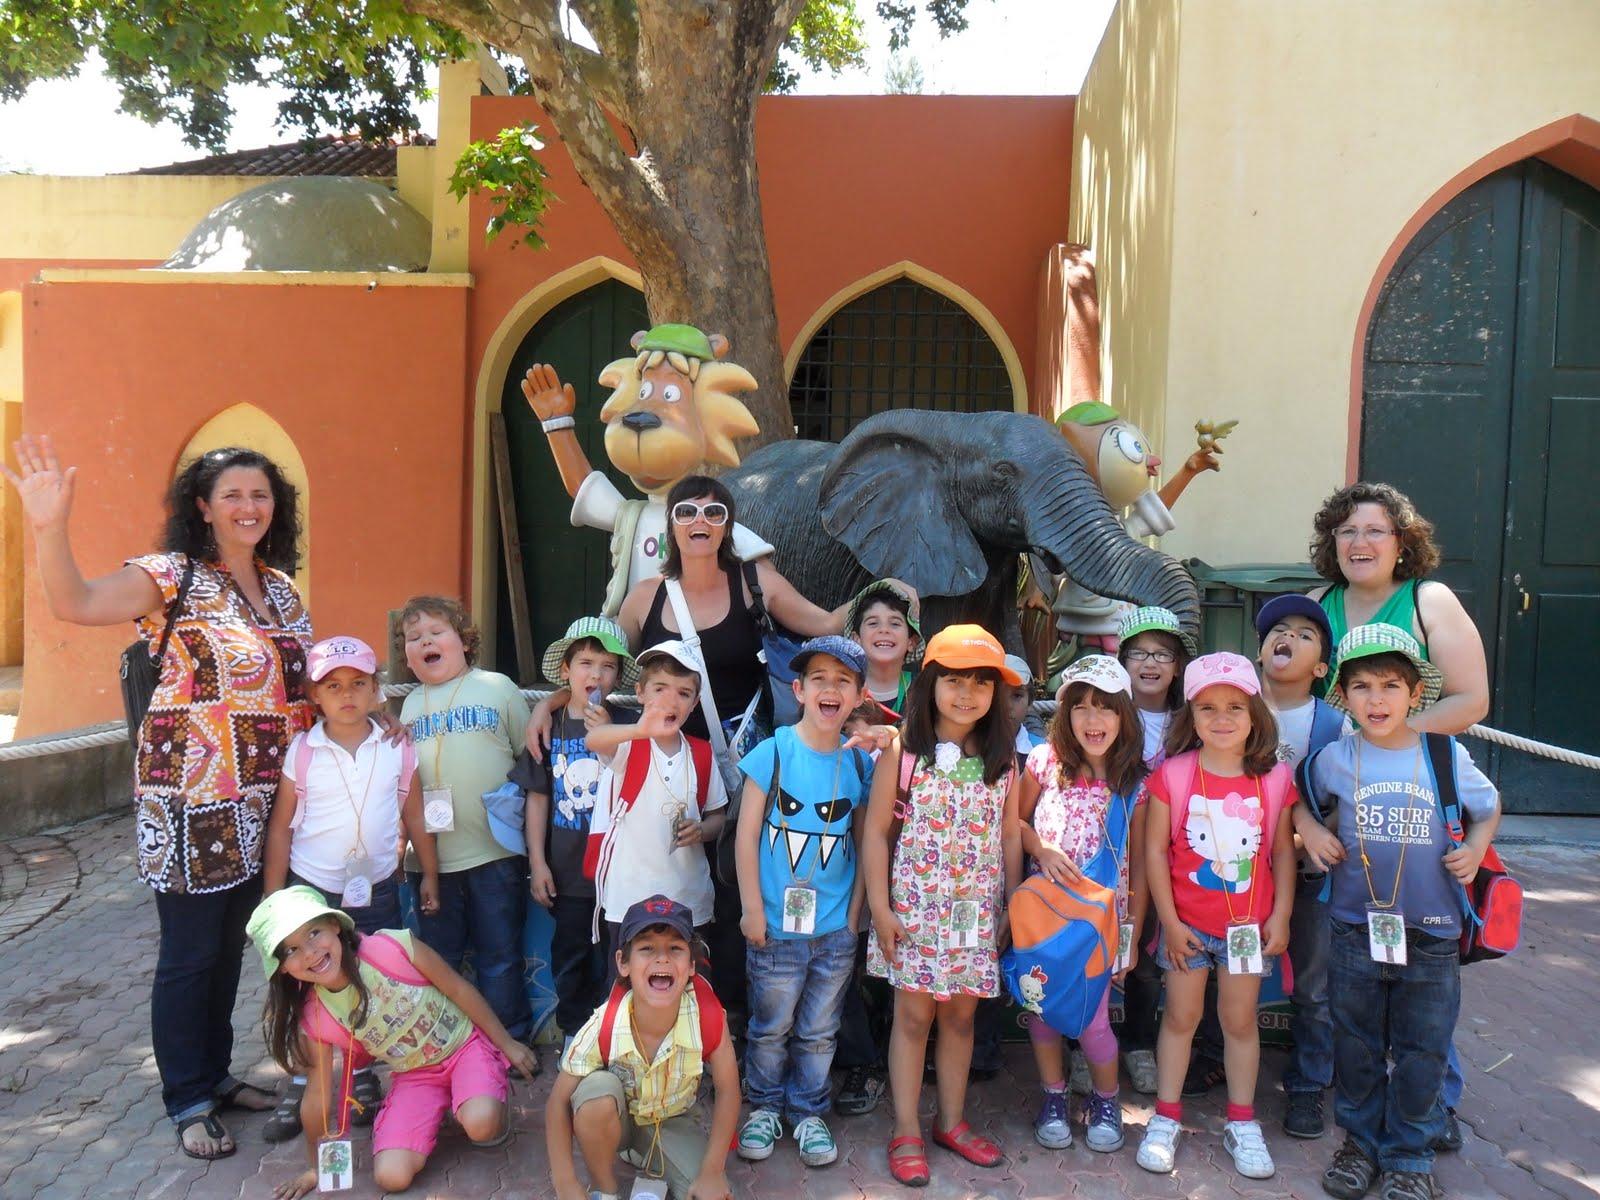 fotos do jardim zoologico de lisboa